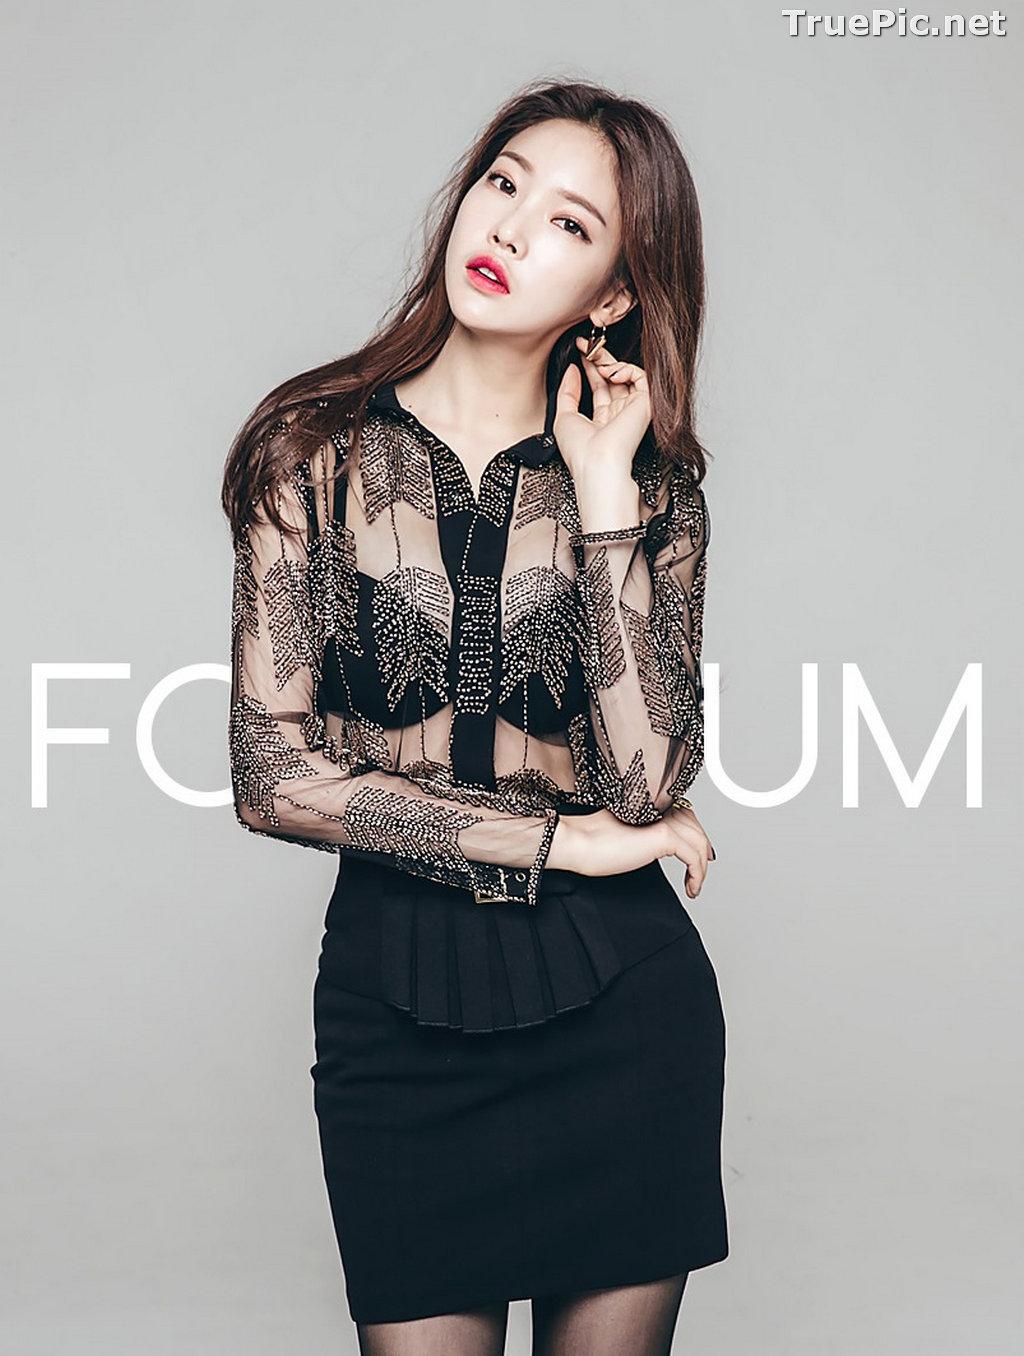 Image Korean Beautiful Model – Park Jung Yoon – Fashion Photography #11 - TruePic.net - Picture-43